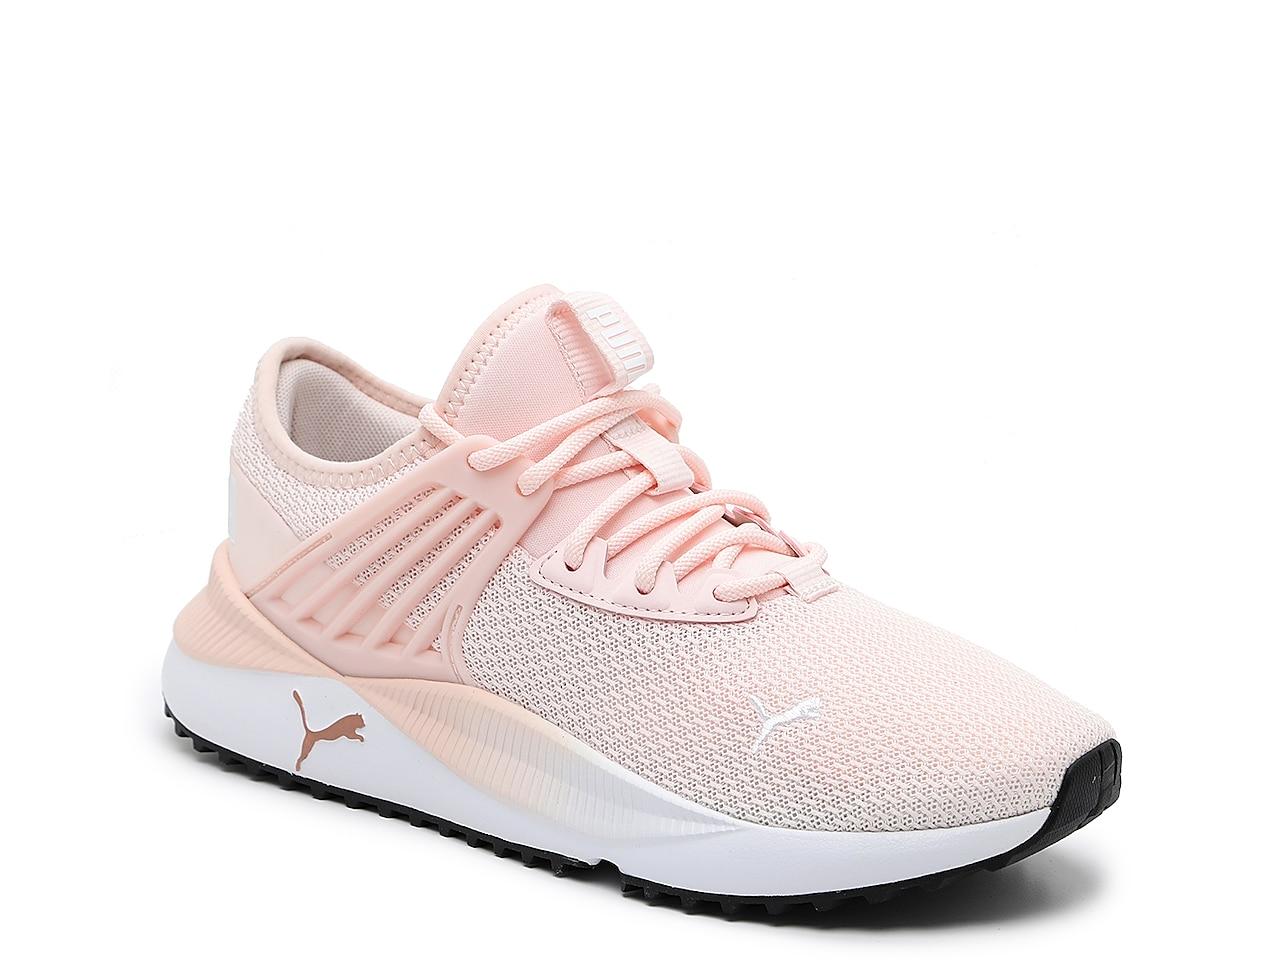 Puma Pacer Future Running Shoe - Women's